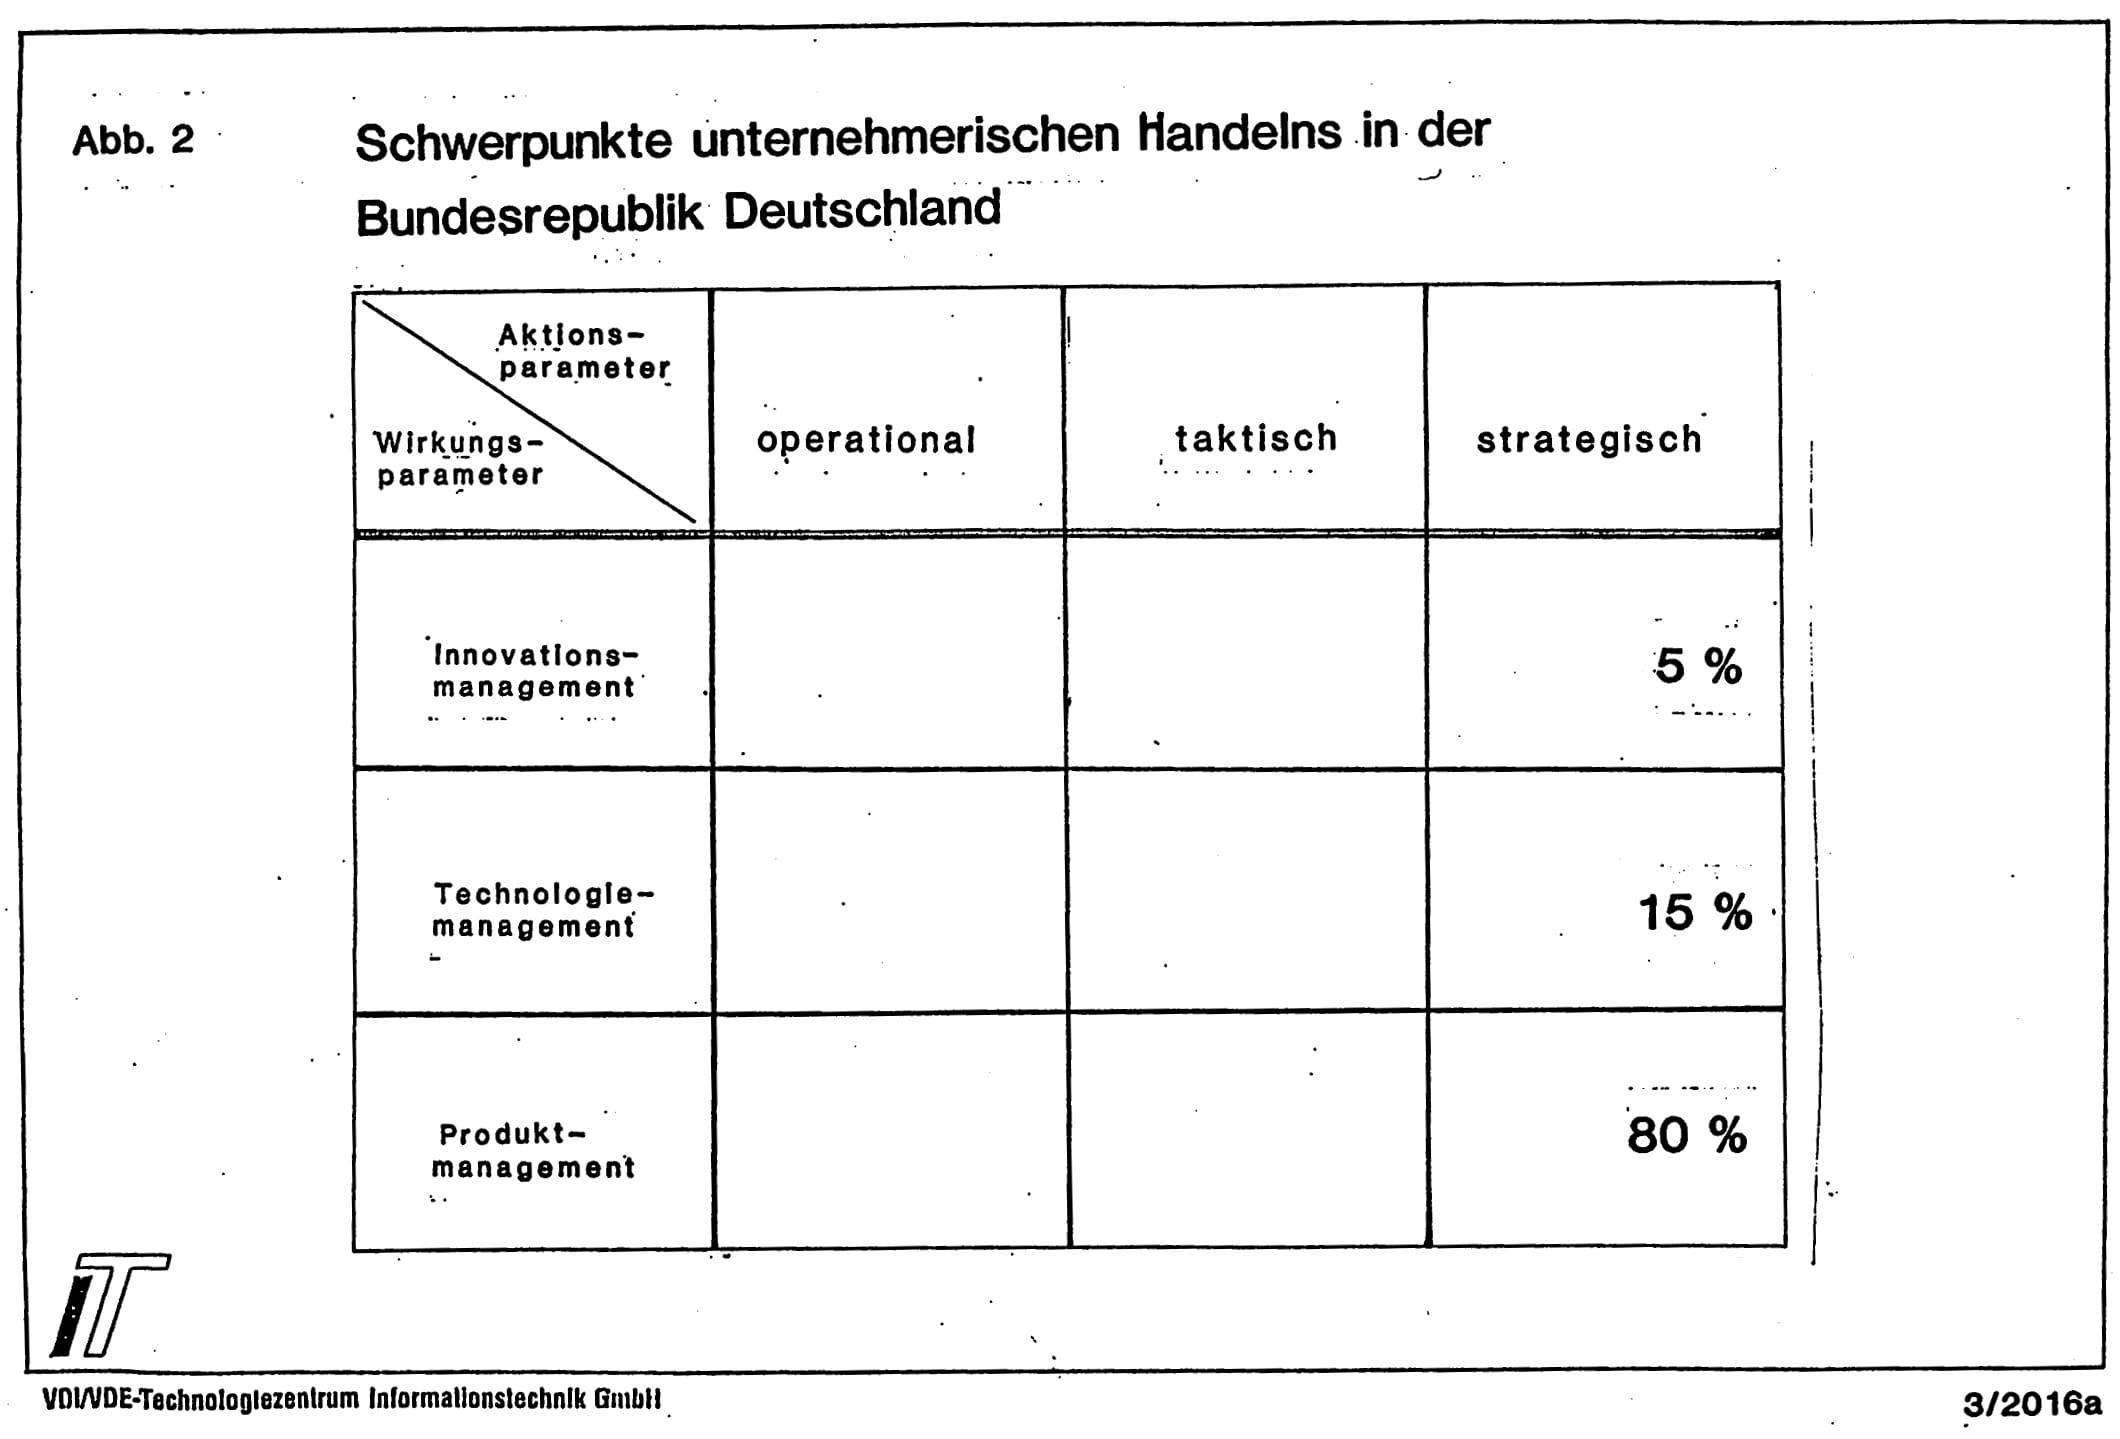 1987_02_05_DIHT-Artikeldienst_kpf-Schlüsseltechnologie-Mikroelektronik_02